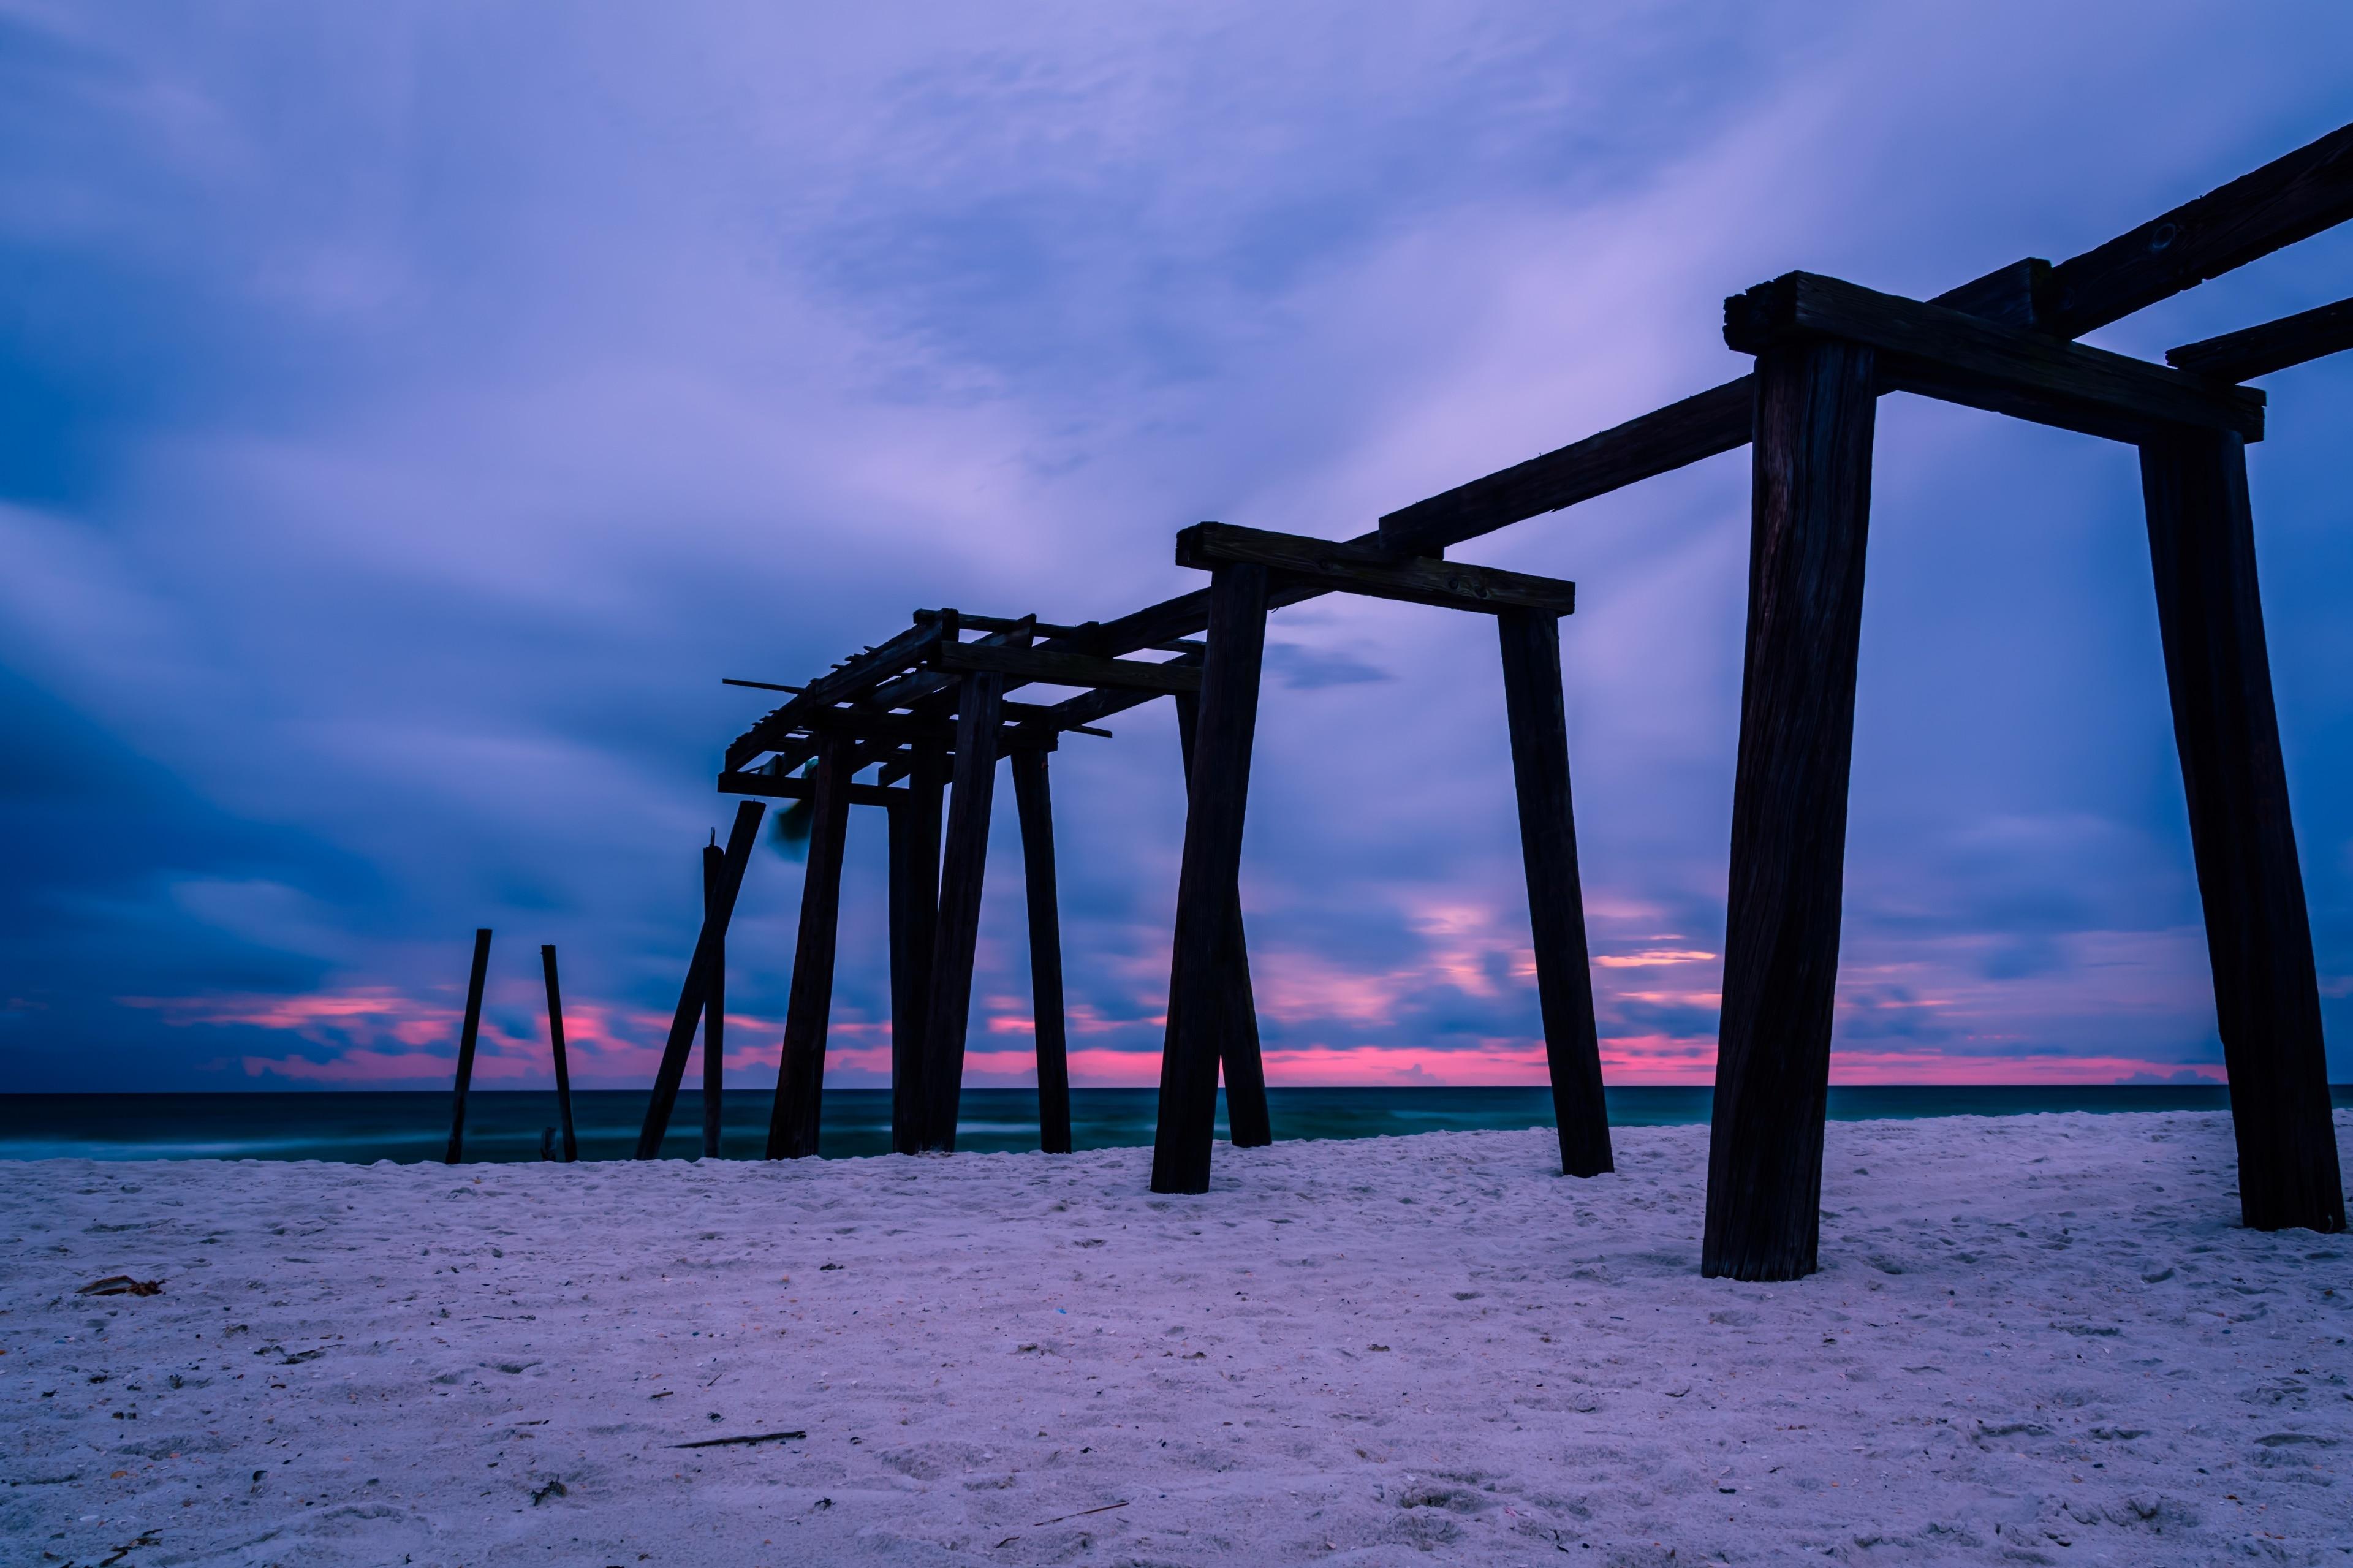 Sunnyside, FL